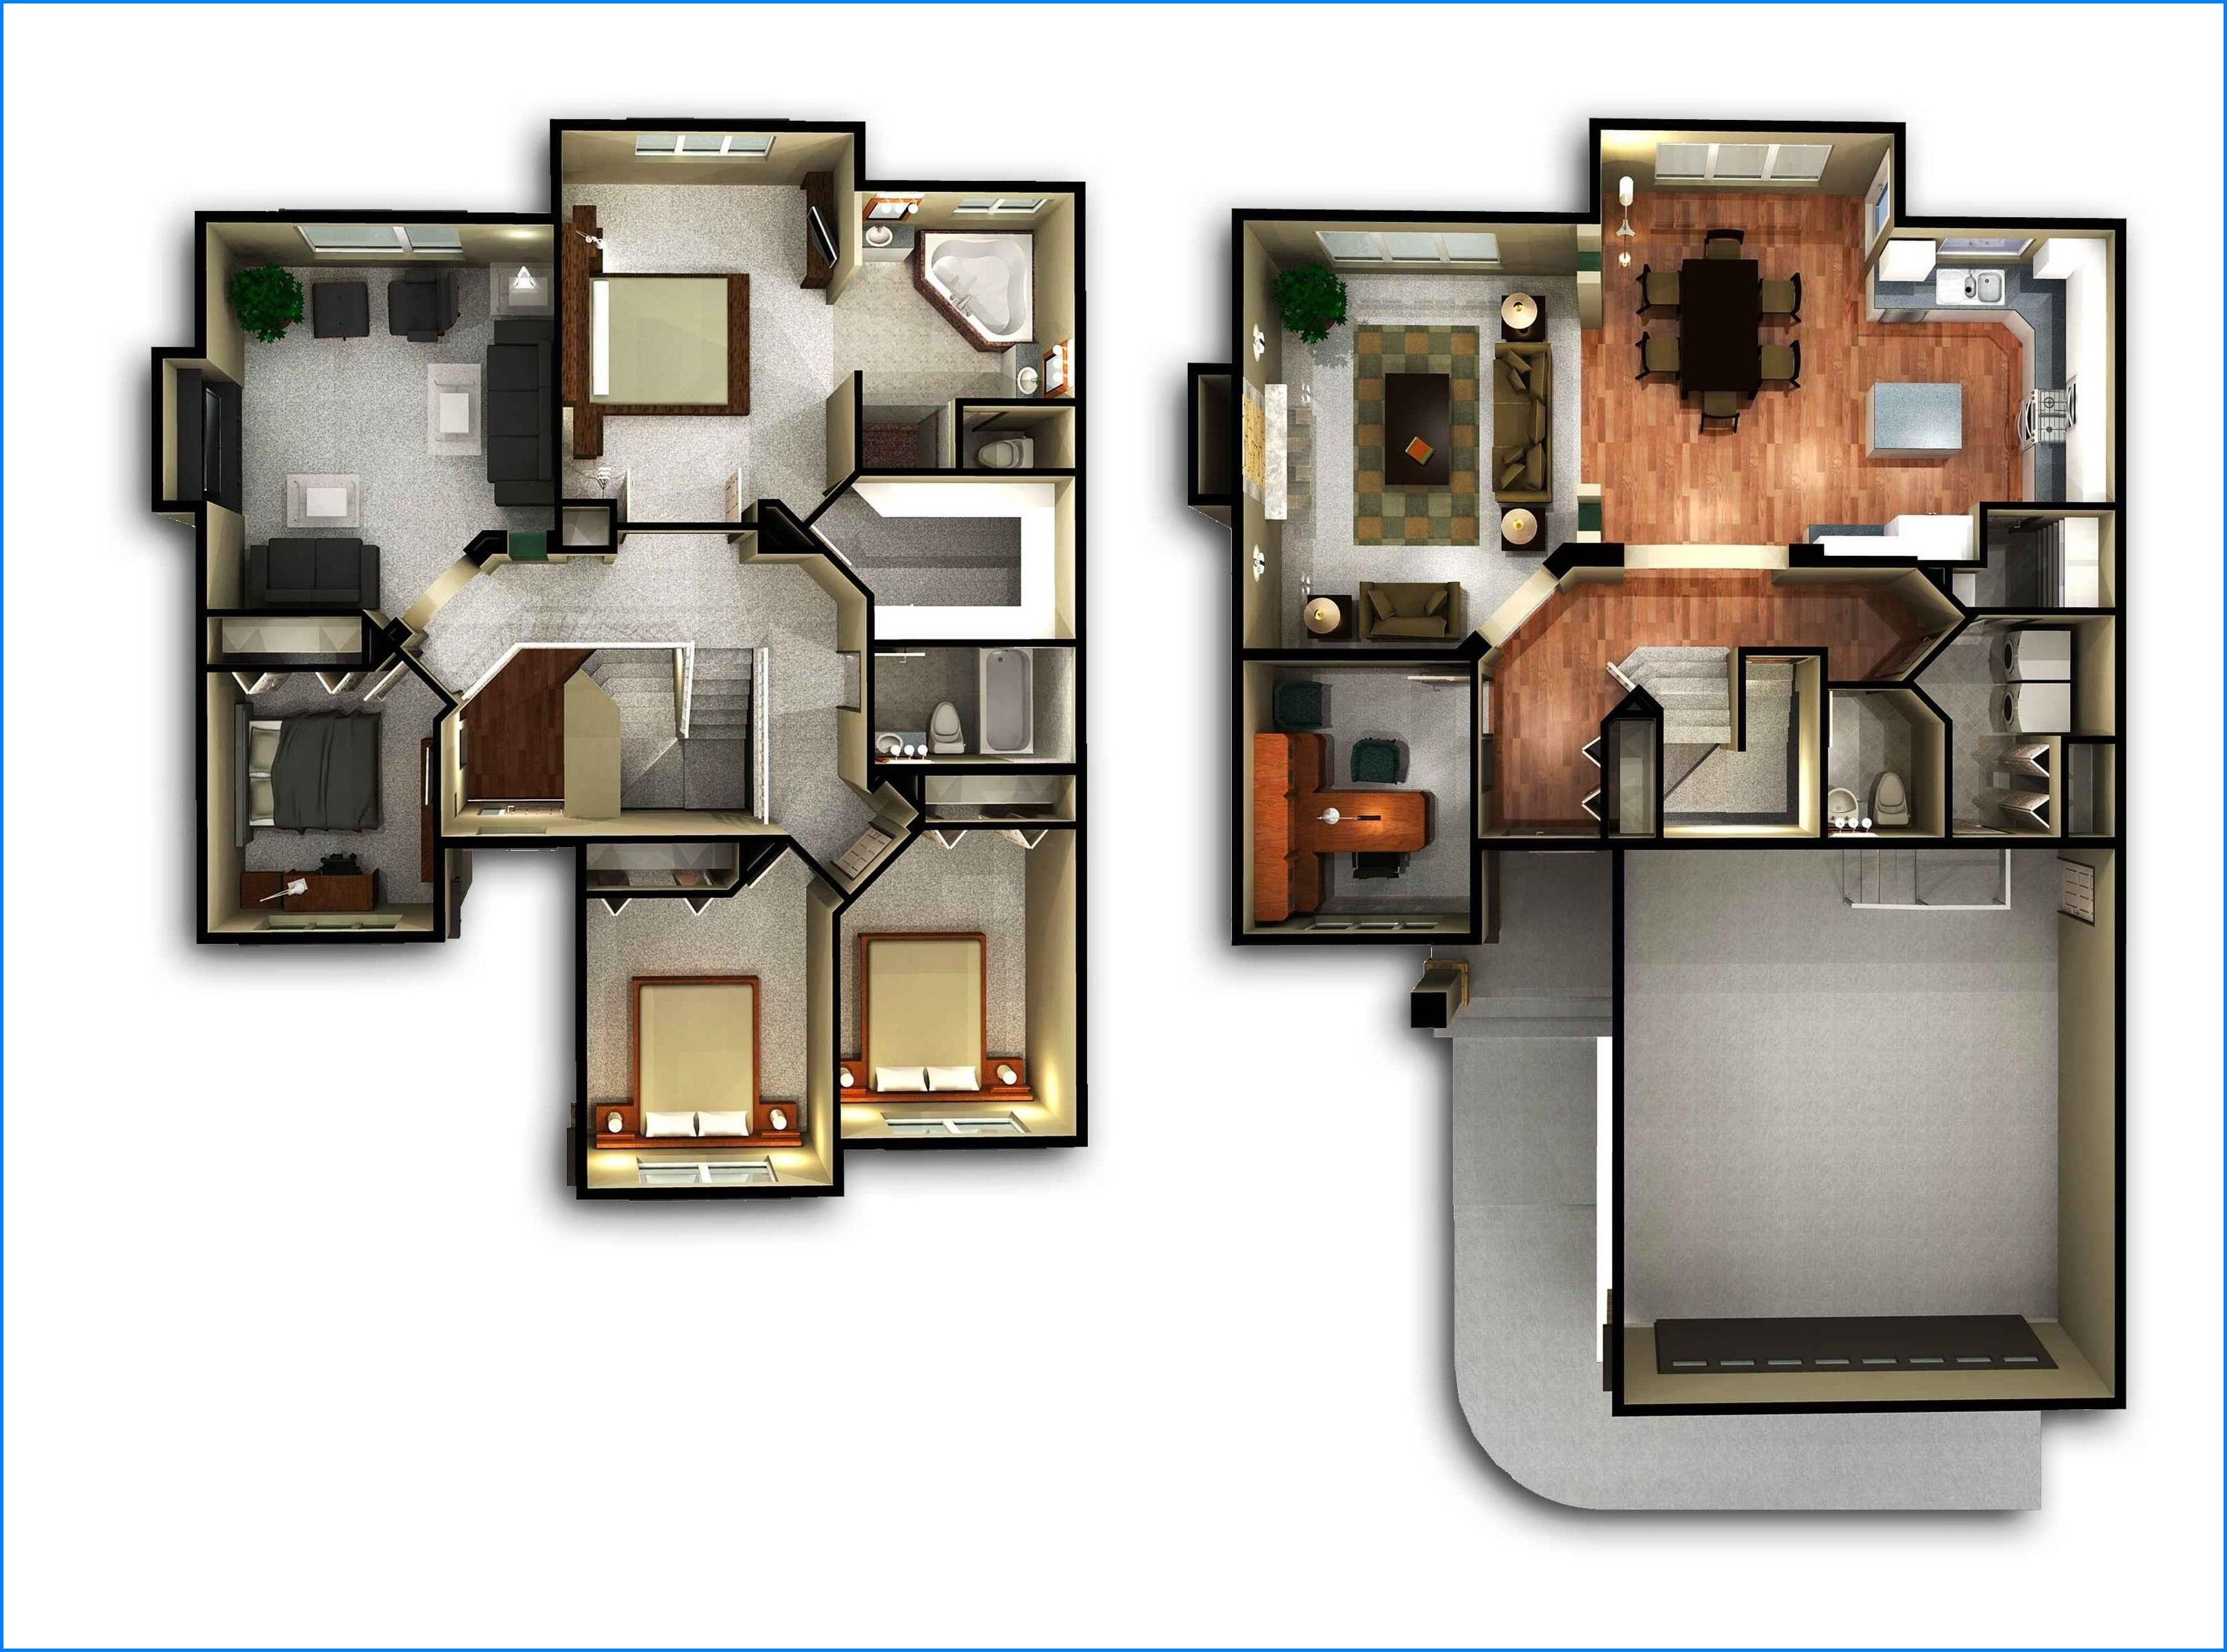 Rumah Minimalis 2 Lantai Ukuran 5x12 Dshdesign4kinfo